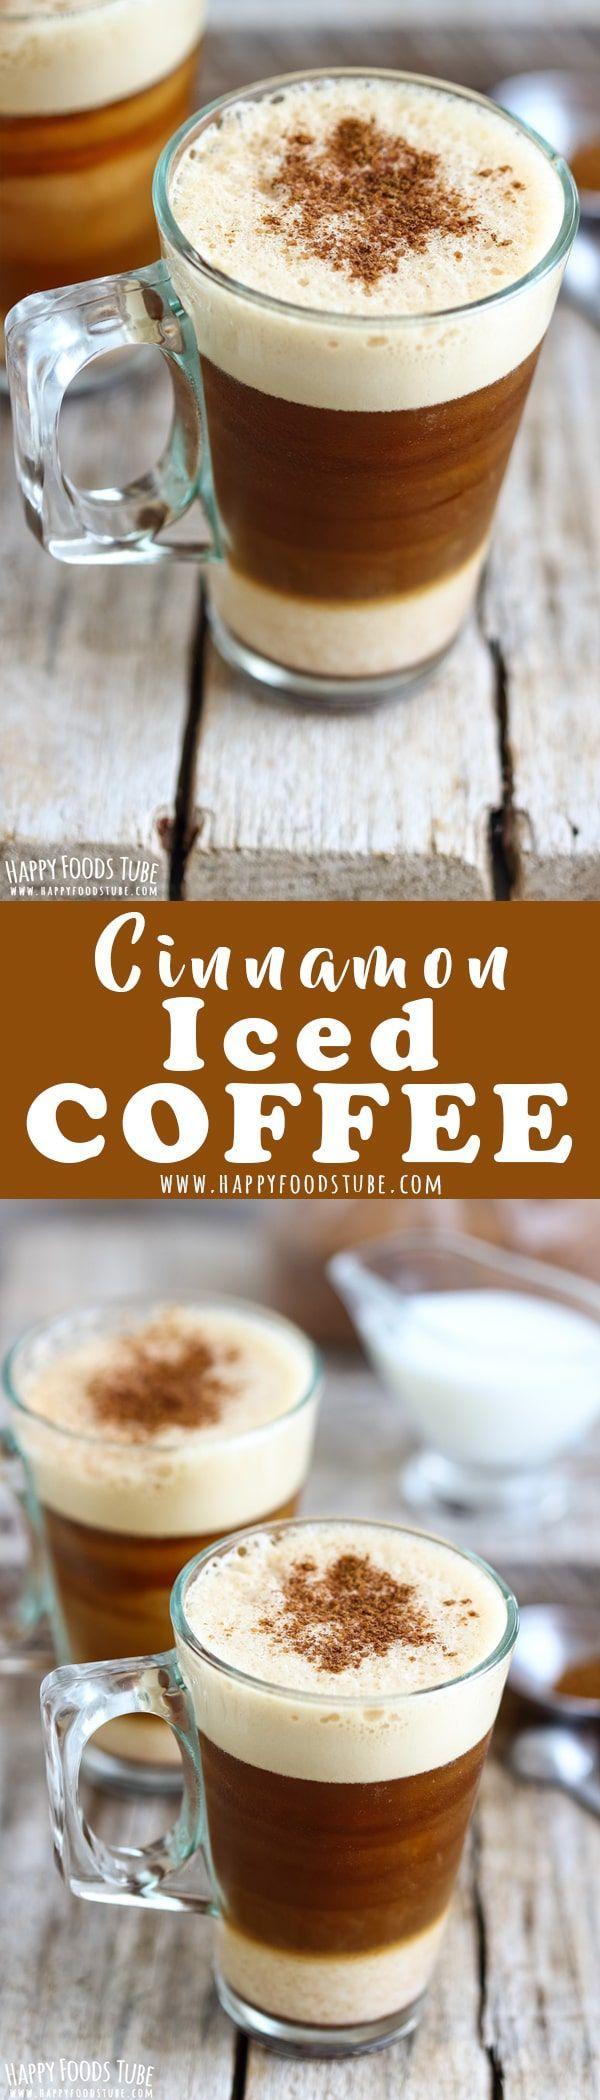 Coffee break erin duh s everything - Cinnamon Iced Instant Coffee